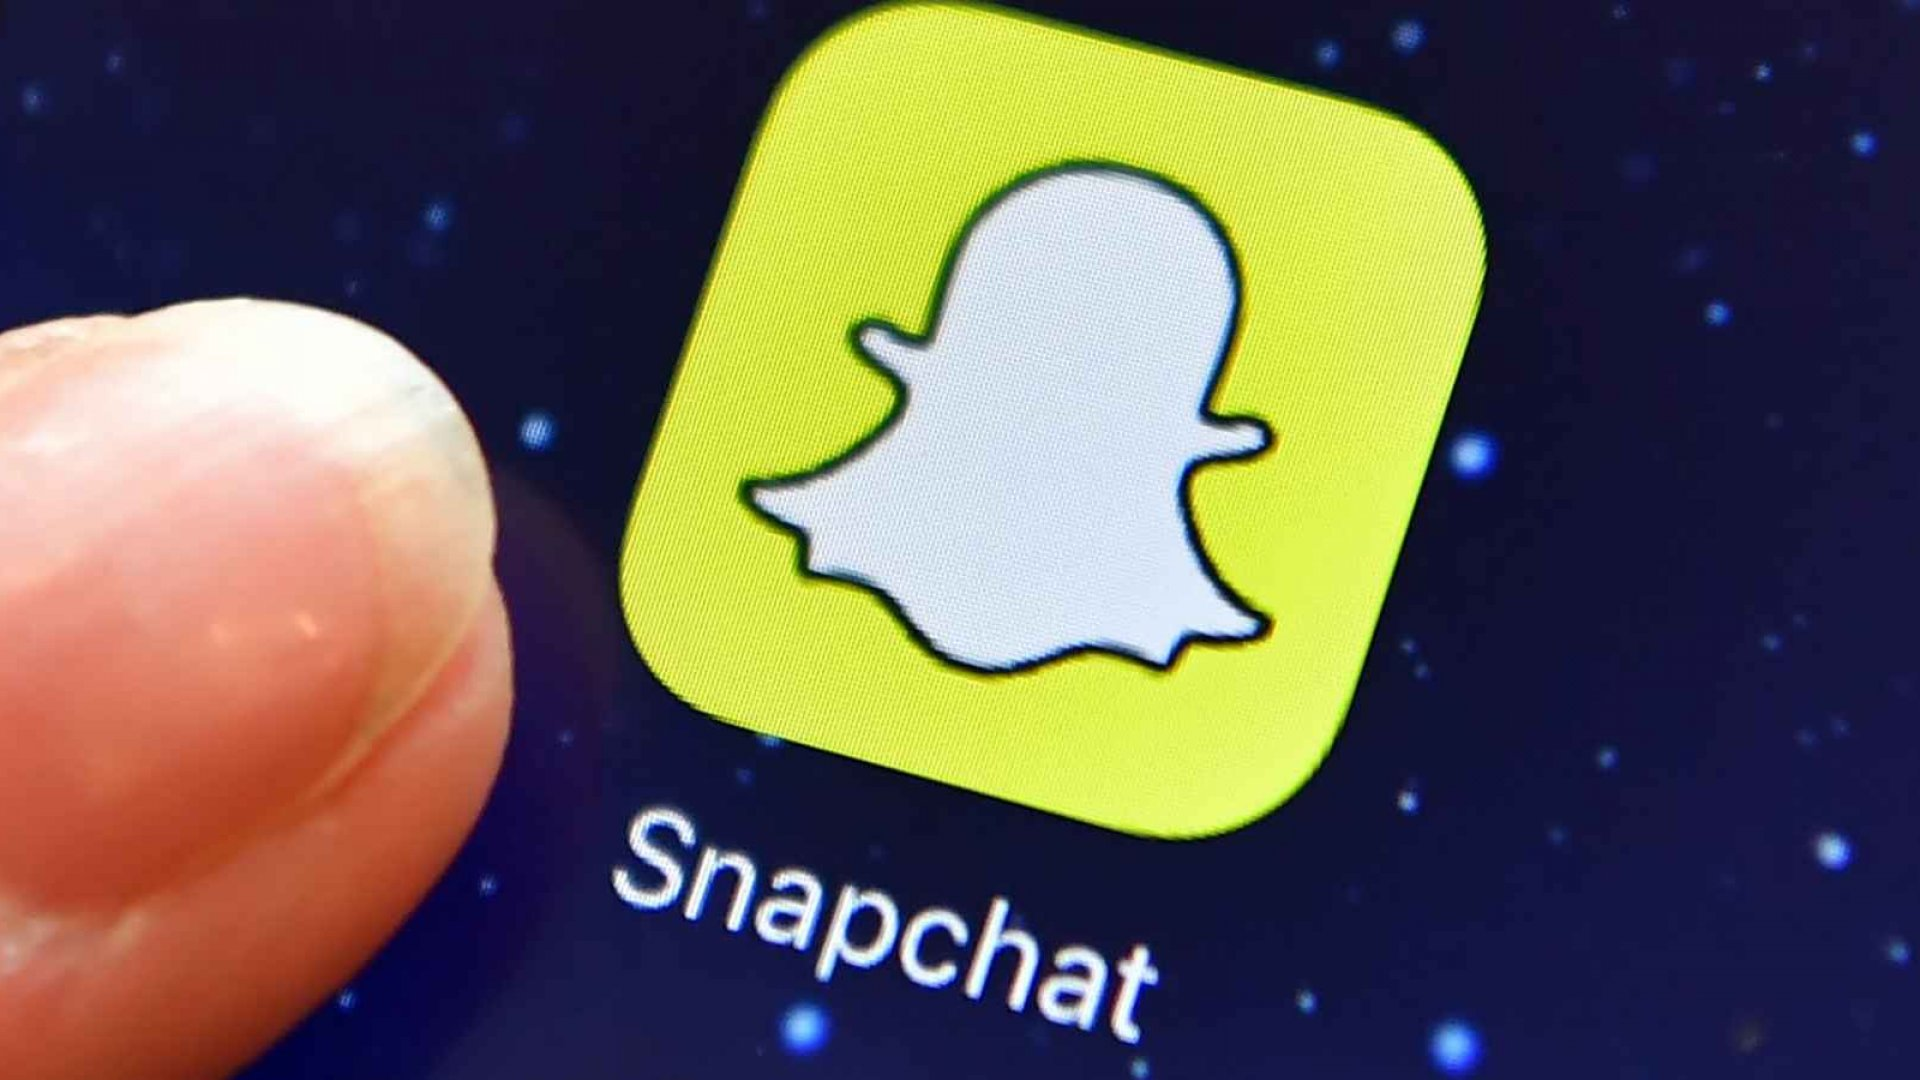 Snapchat Closing in on $1 Billion Revenue Mark